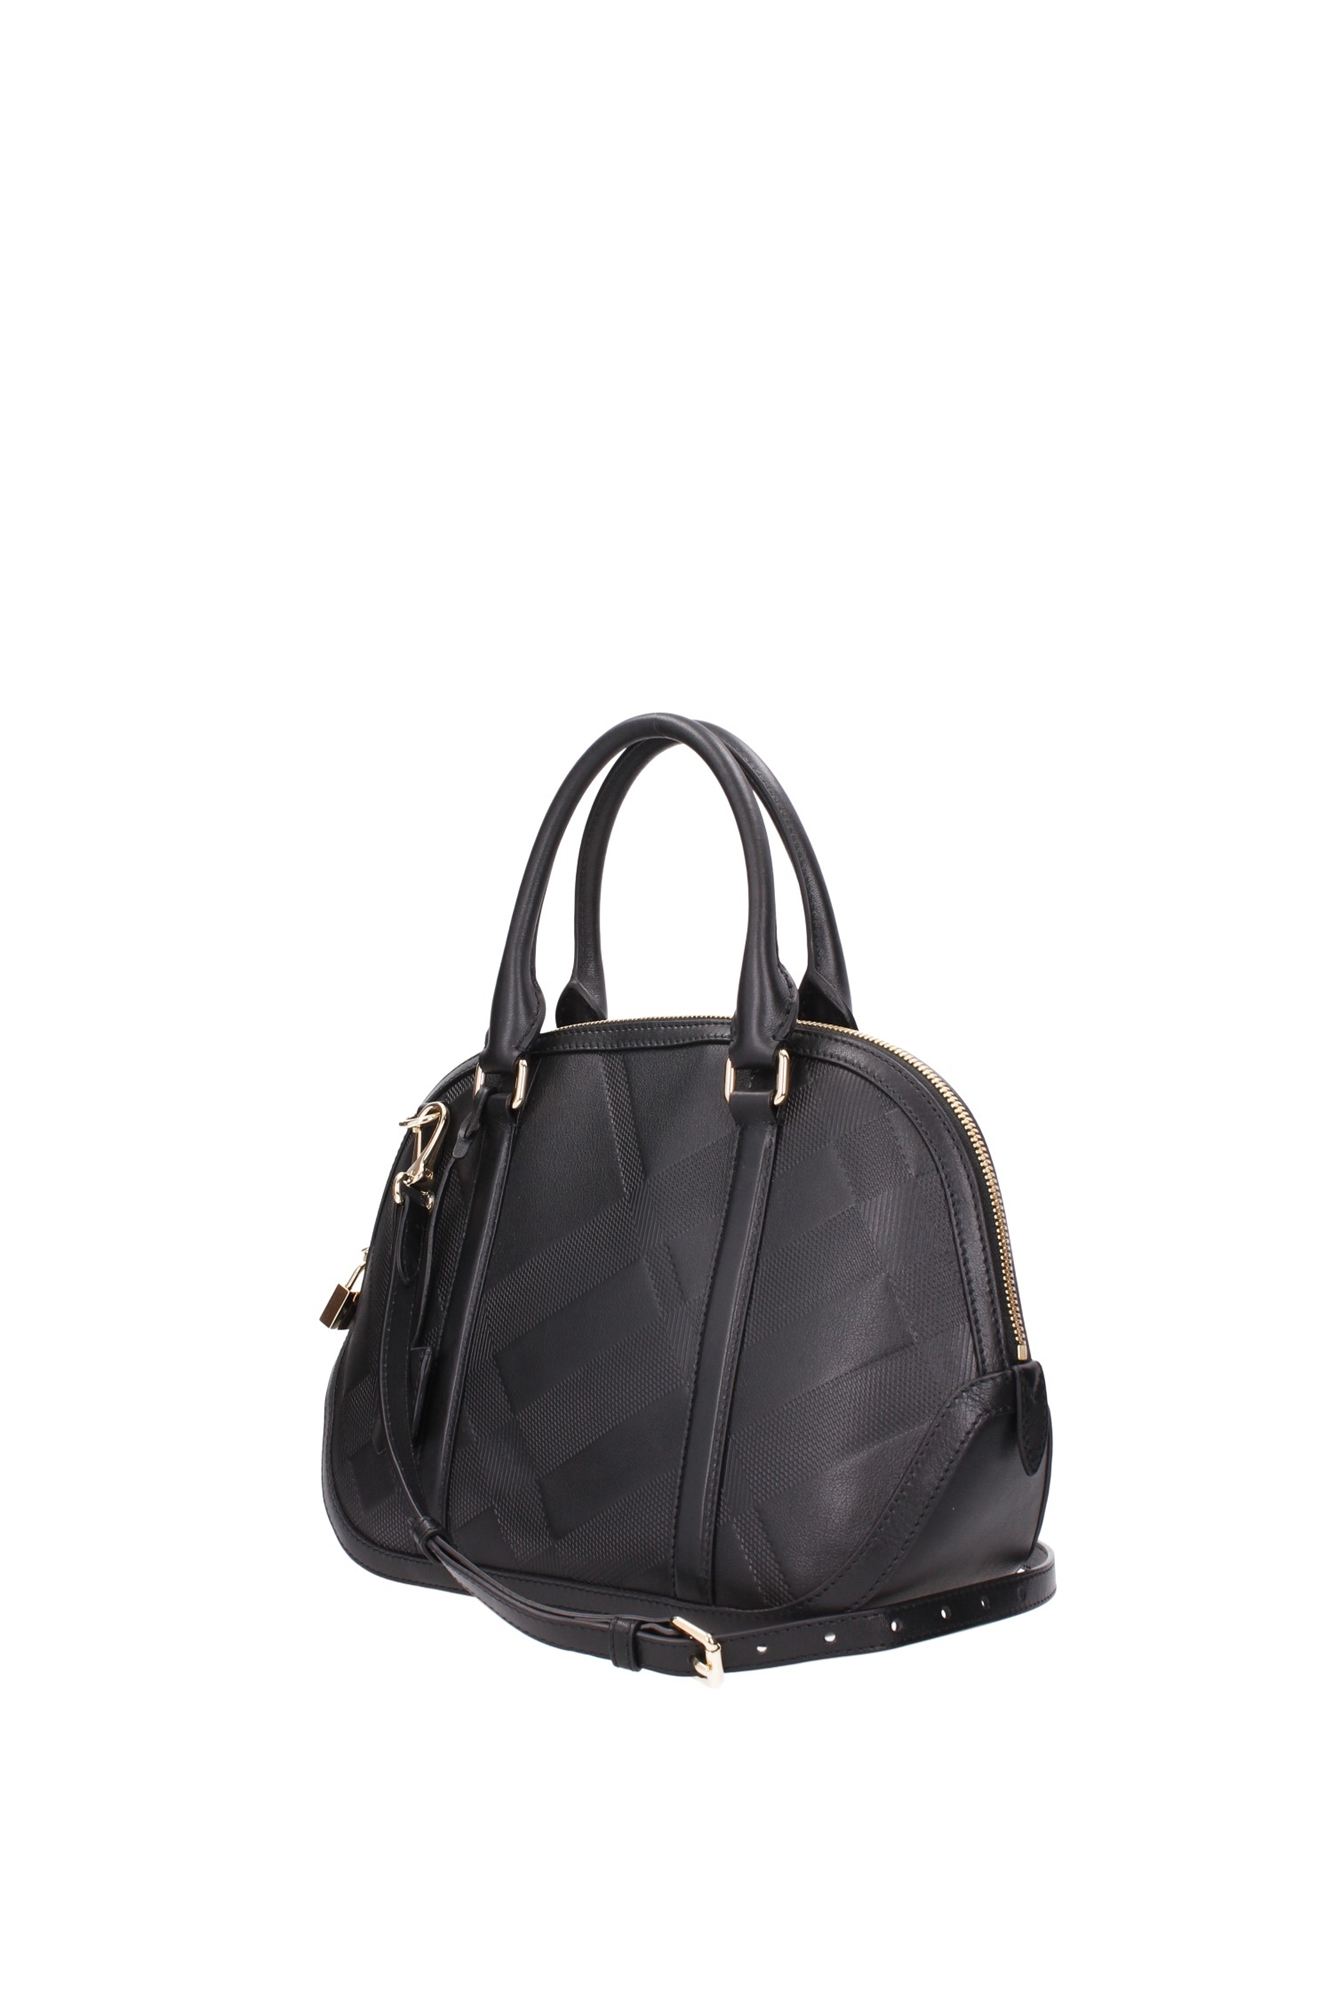 Hand Bags Burberry Women Leather Black 3949802 | eBay